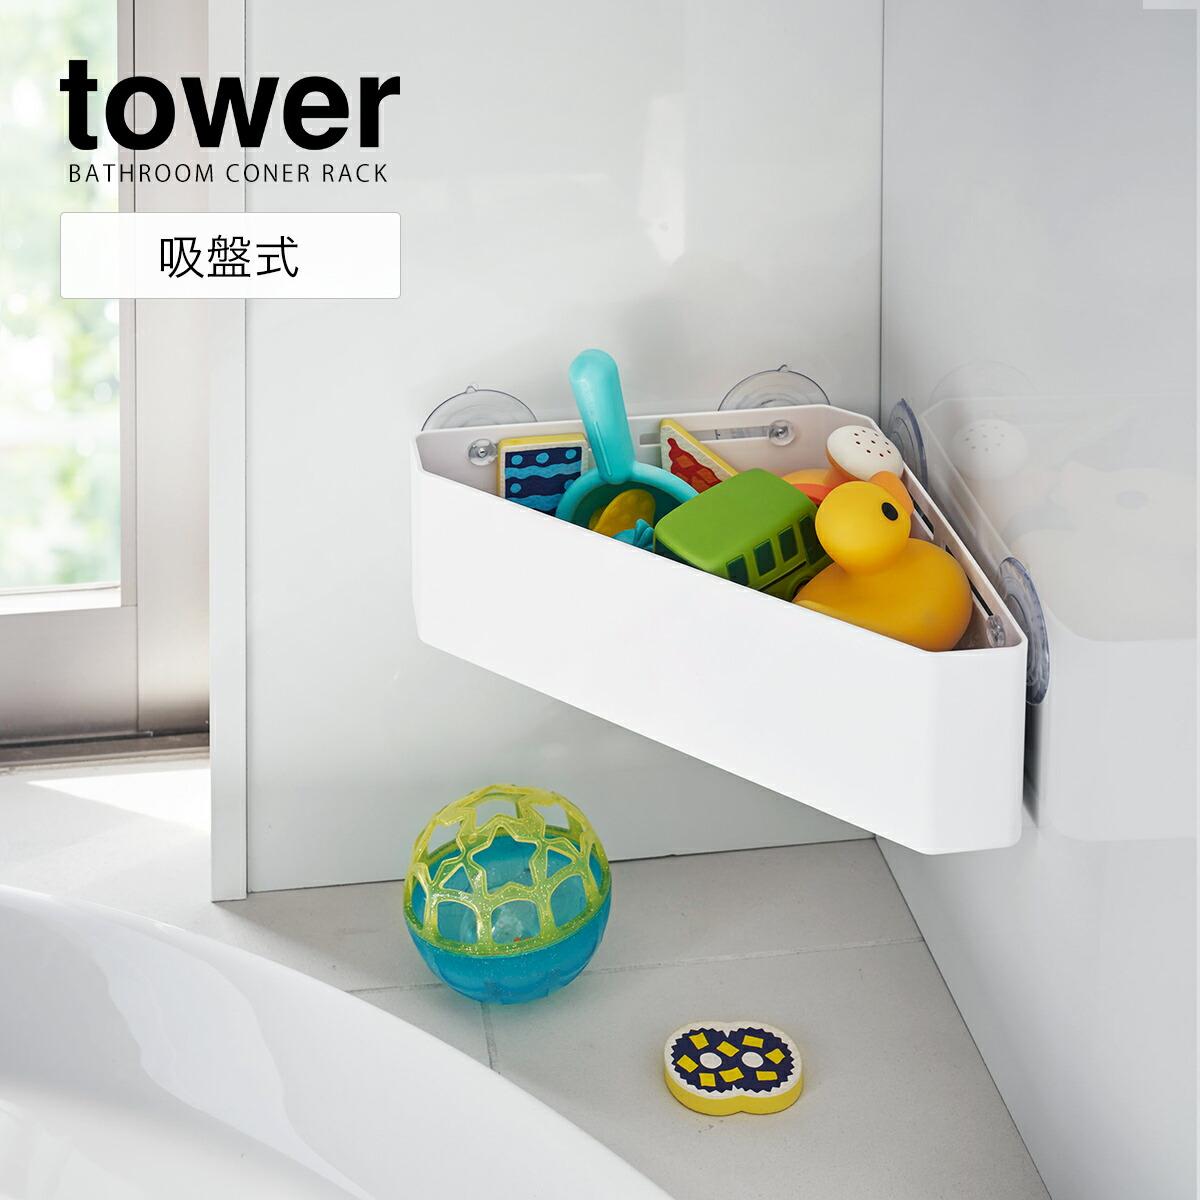 tower タワー おもちゃ入れ バスルーム 吸盤